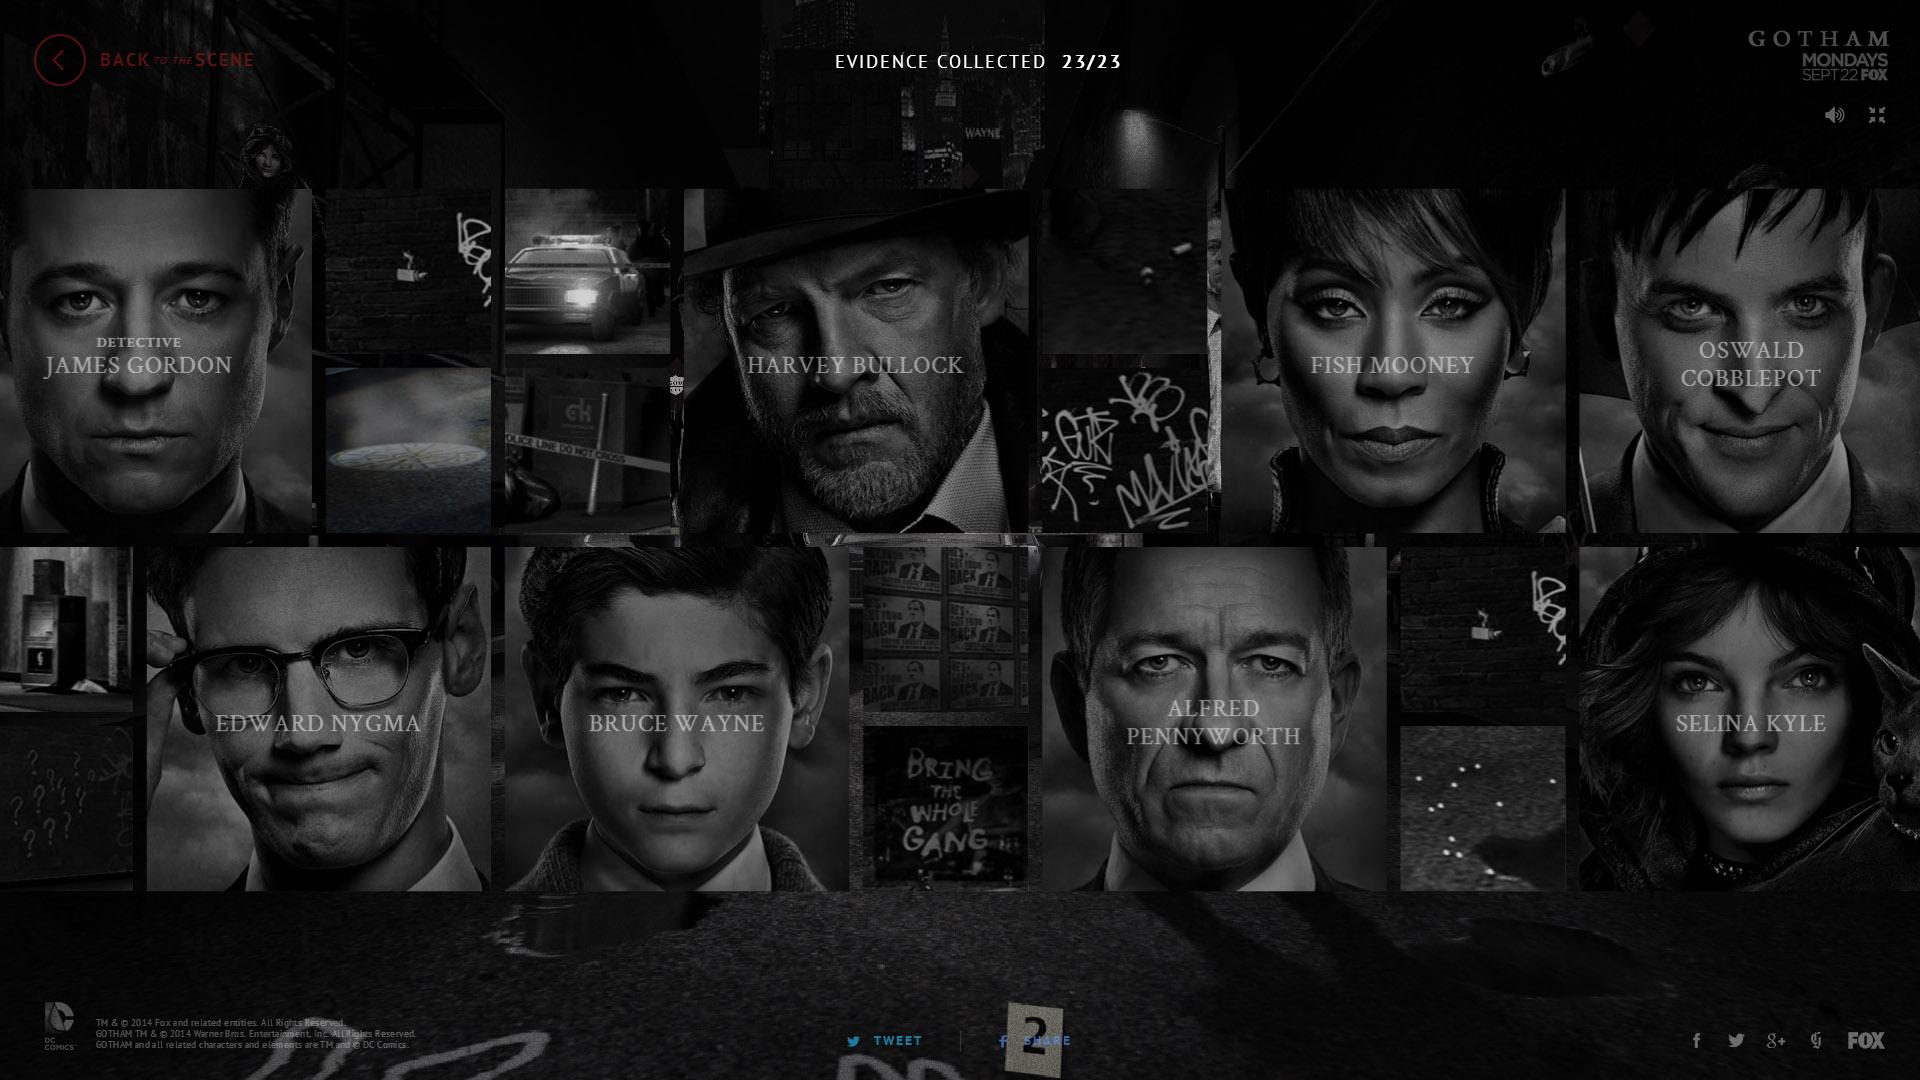 Gotham Fox Tv Show Poster